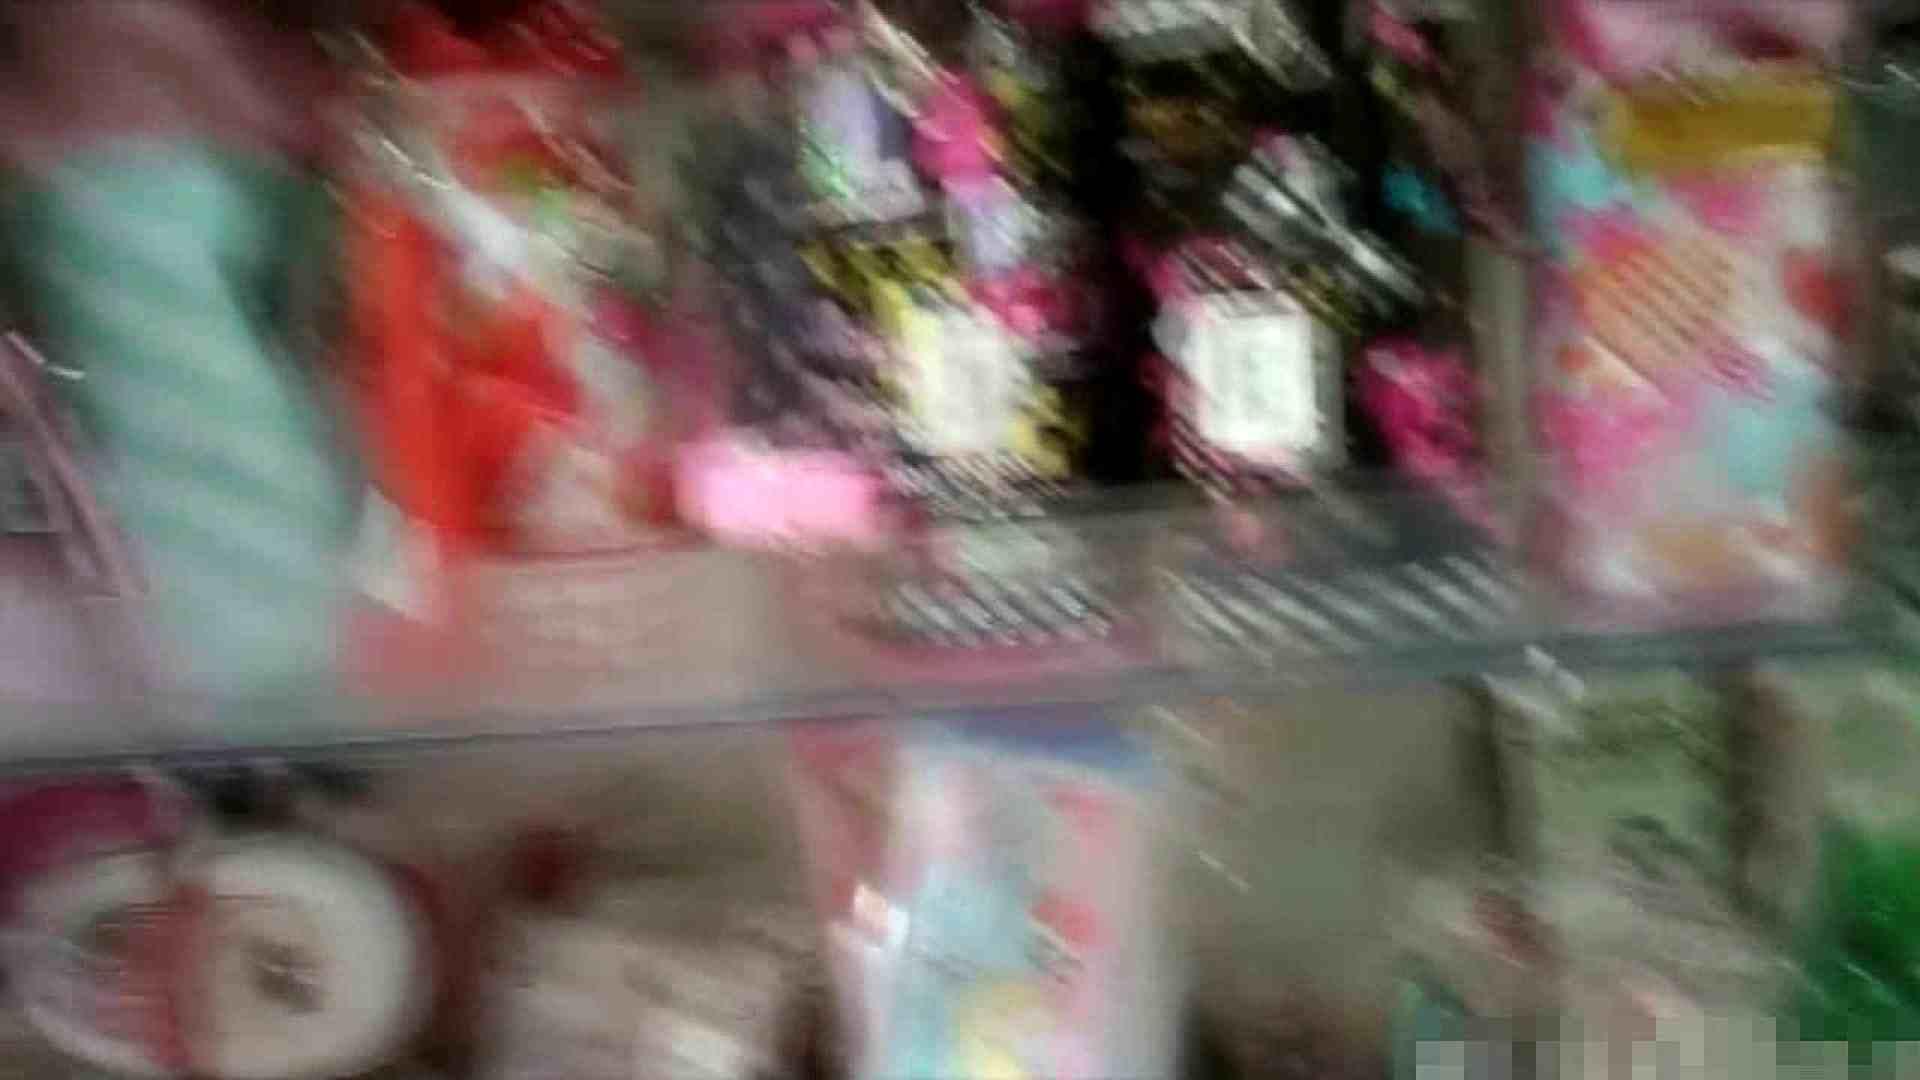 NO.5 意外に豊満な胸の雑貨屋で物色中のお女市さん 胸チラ   チラ見せ  66PIX 11